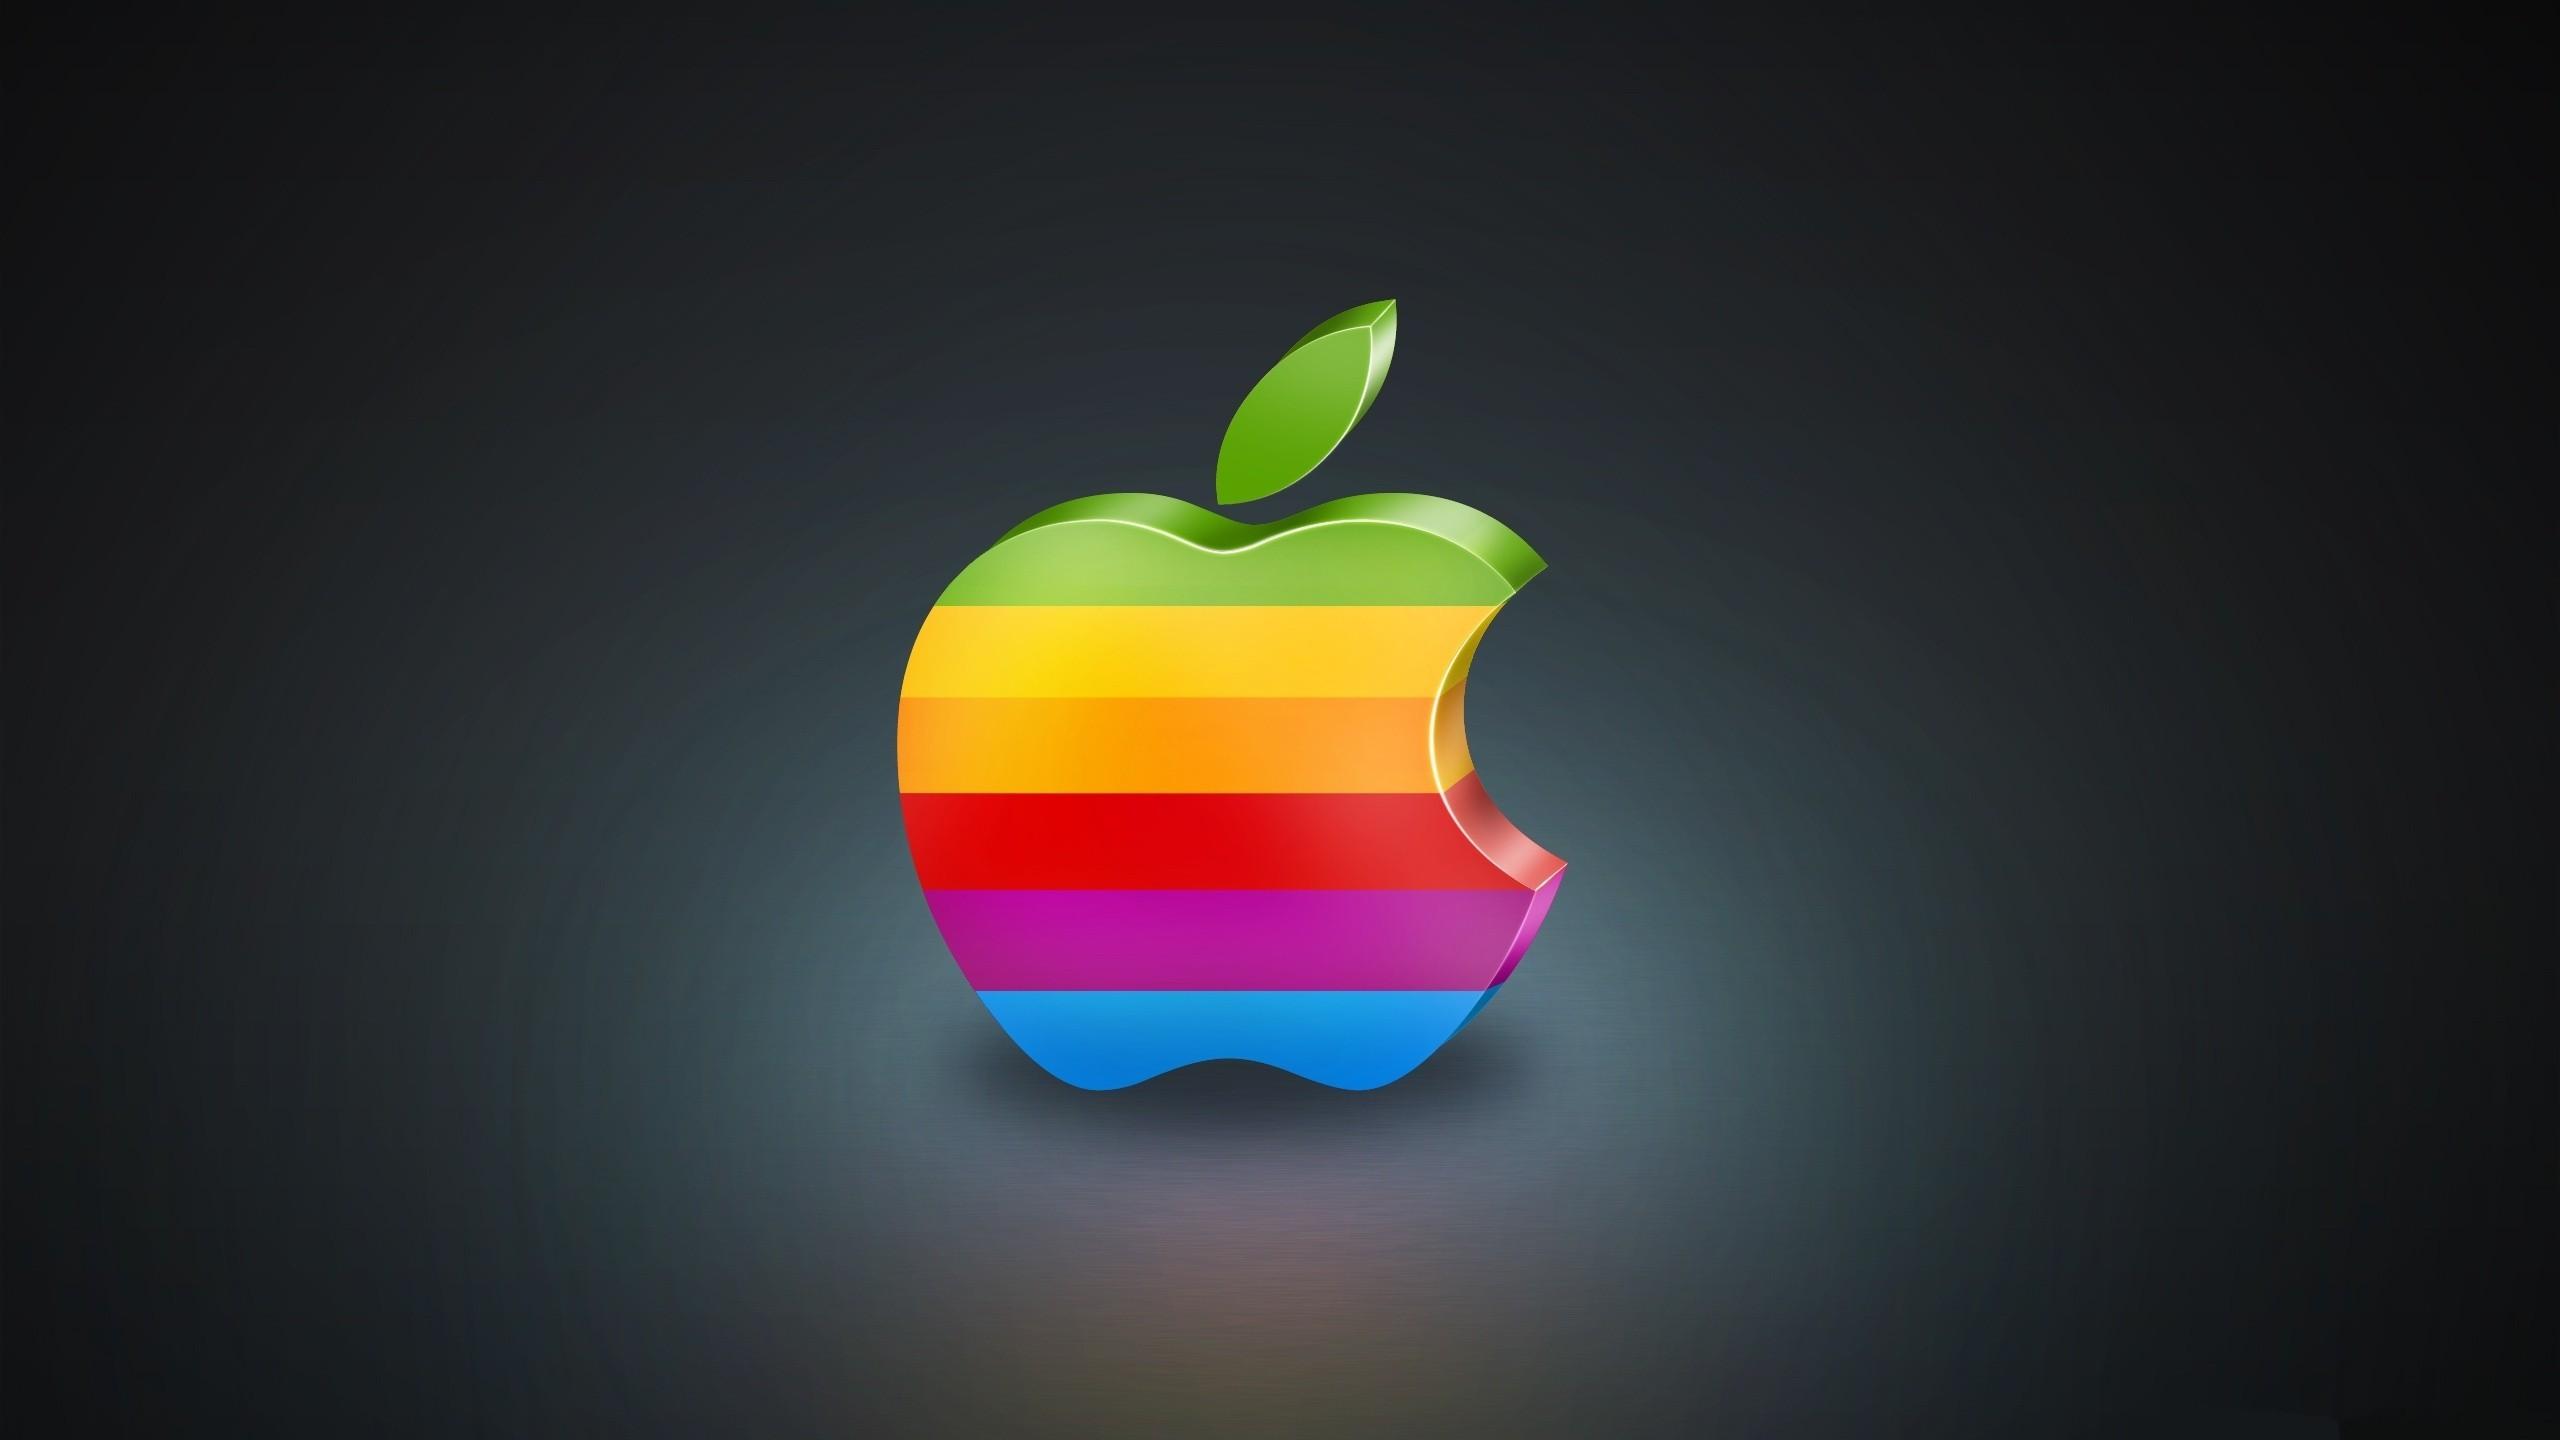 Res: 2560x1440, Apple 3d Wallpaper  Download Desktop Wallpapers HD Images Amazing  Background Images Mac Desktop Wallpapers Free Tablet